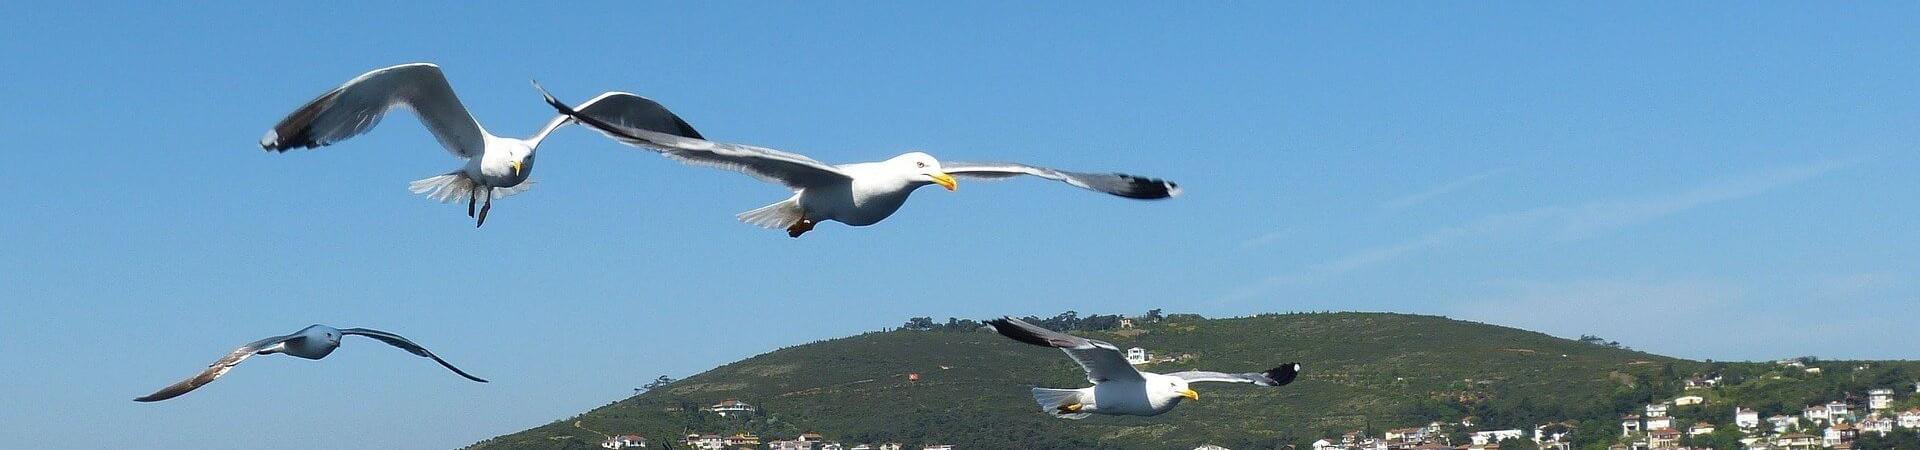 Morze Marmara